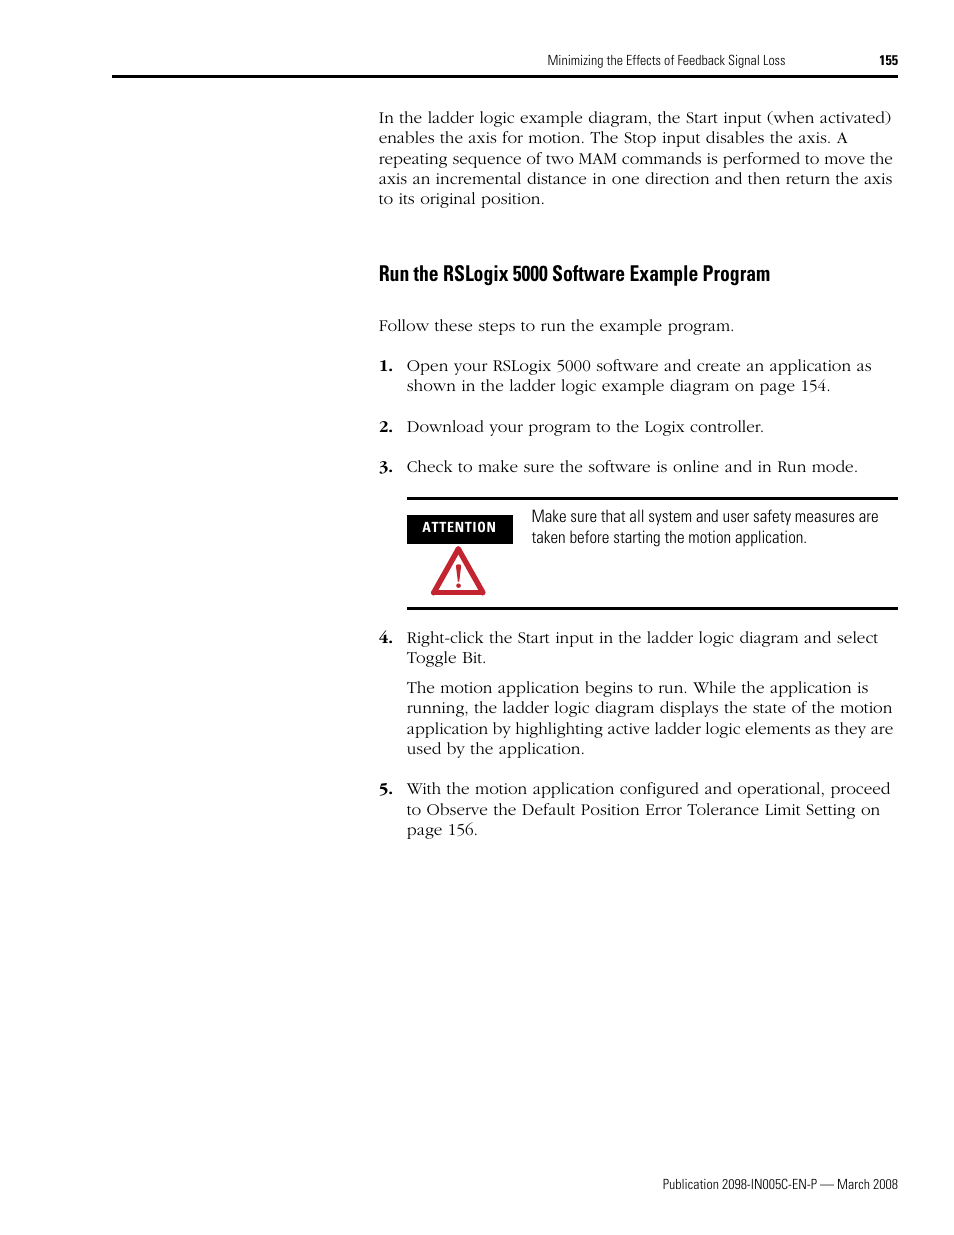 Run The Rslogix 5000 Software Example Program Rockwell Automation Logic Diagram Application 2090 Ultra3000 Servo Drives Integration Manual User Page 155 180